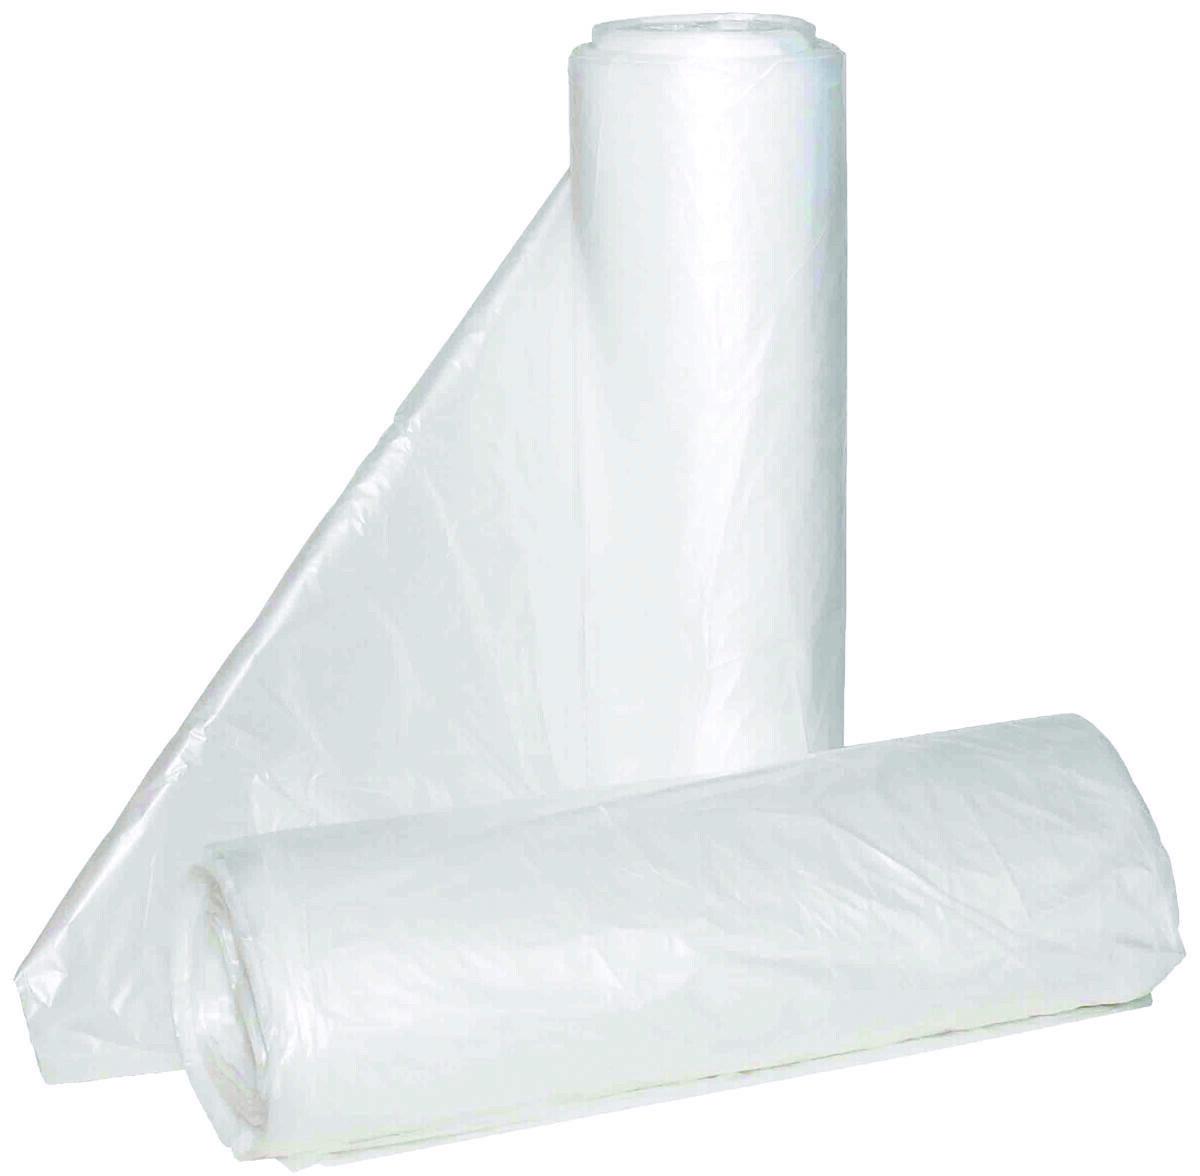 56 Gallon X Heavy Weight Clear Trash Bags Just Supplies Llc